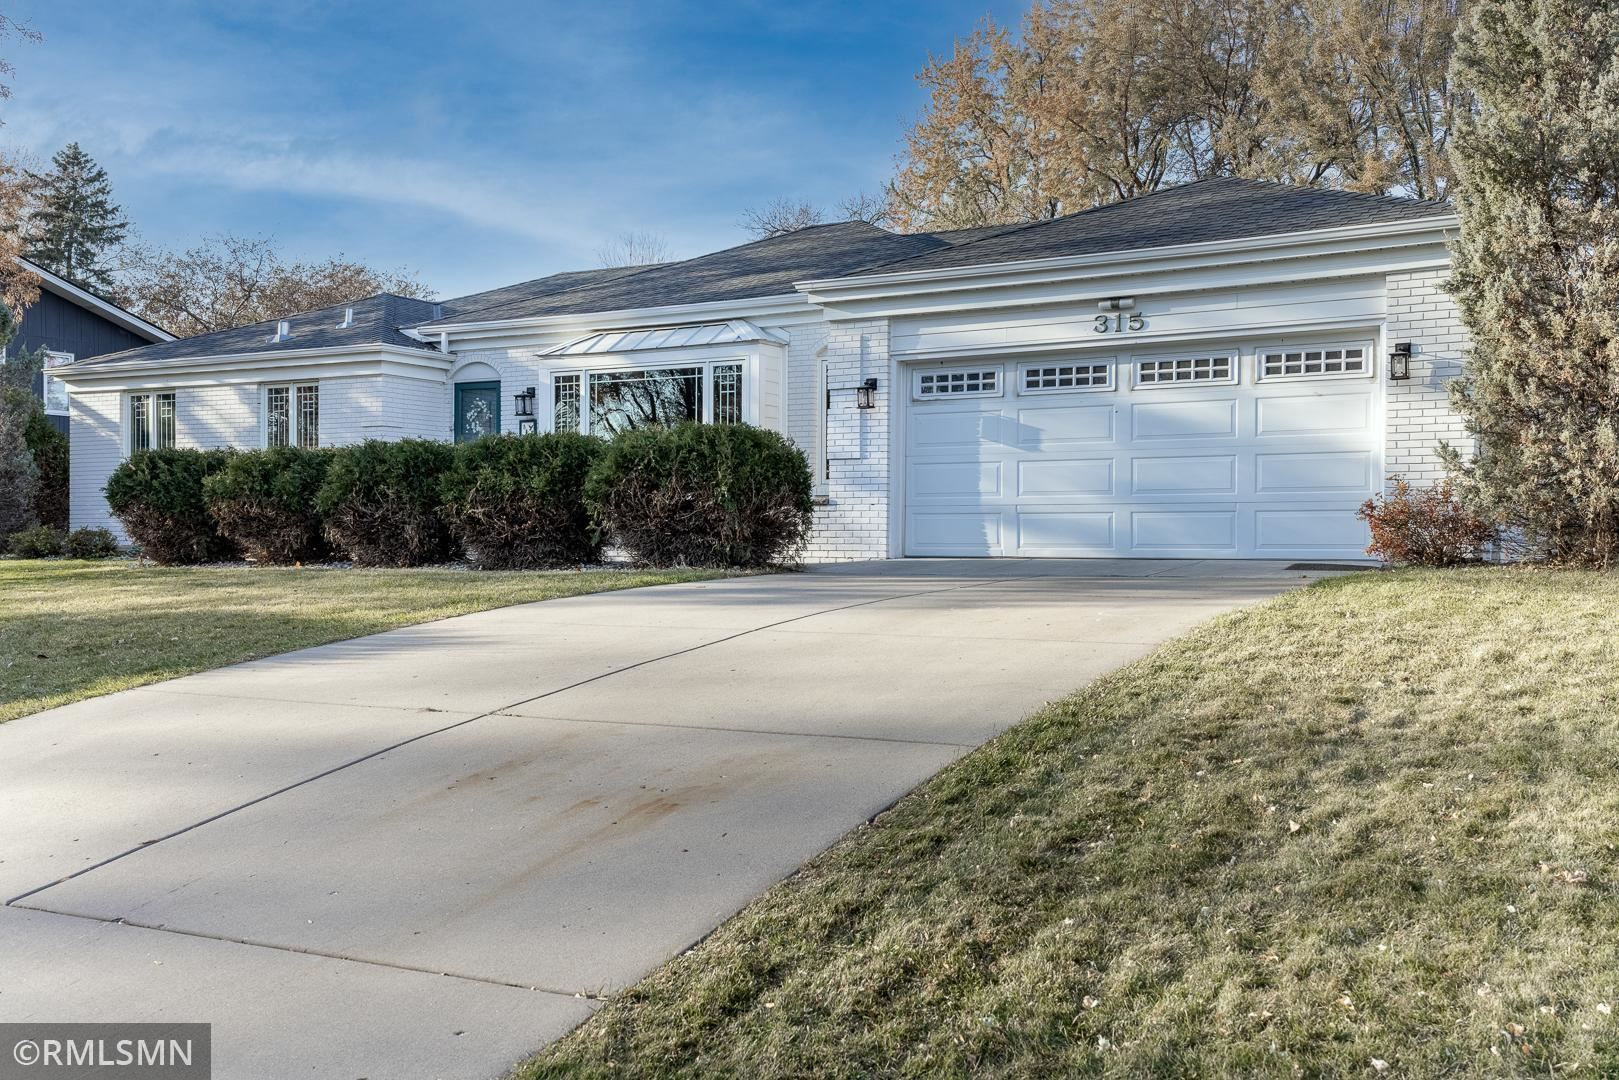 315 Clover Leaf Drive, Golden Valley, MN 55422 - MLS#: 5702782